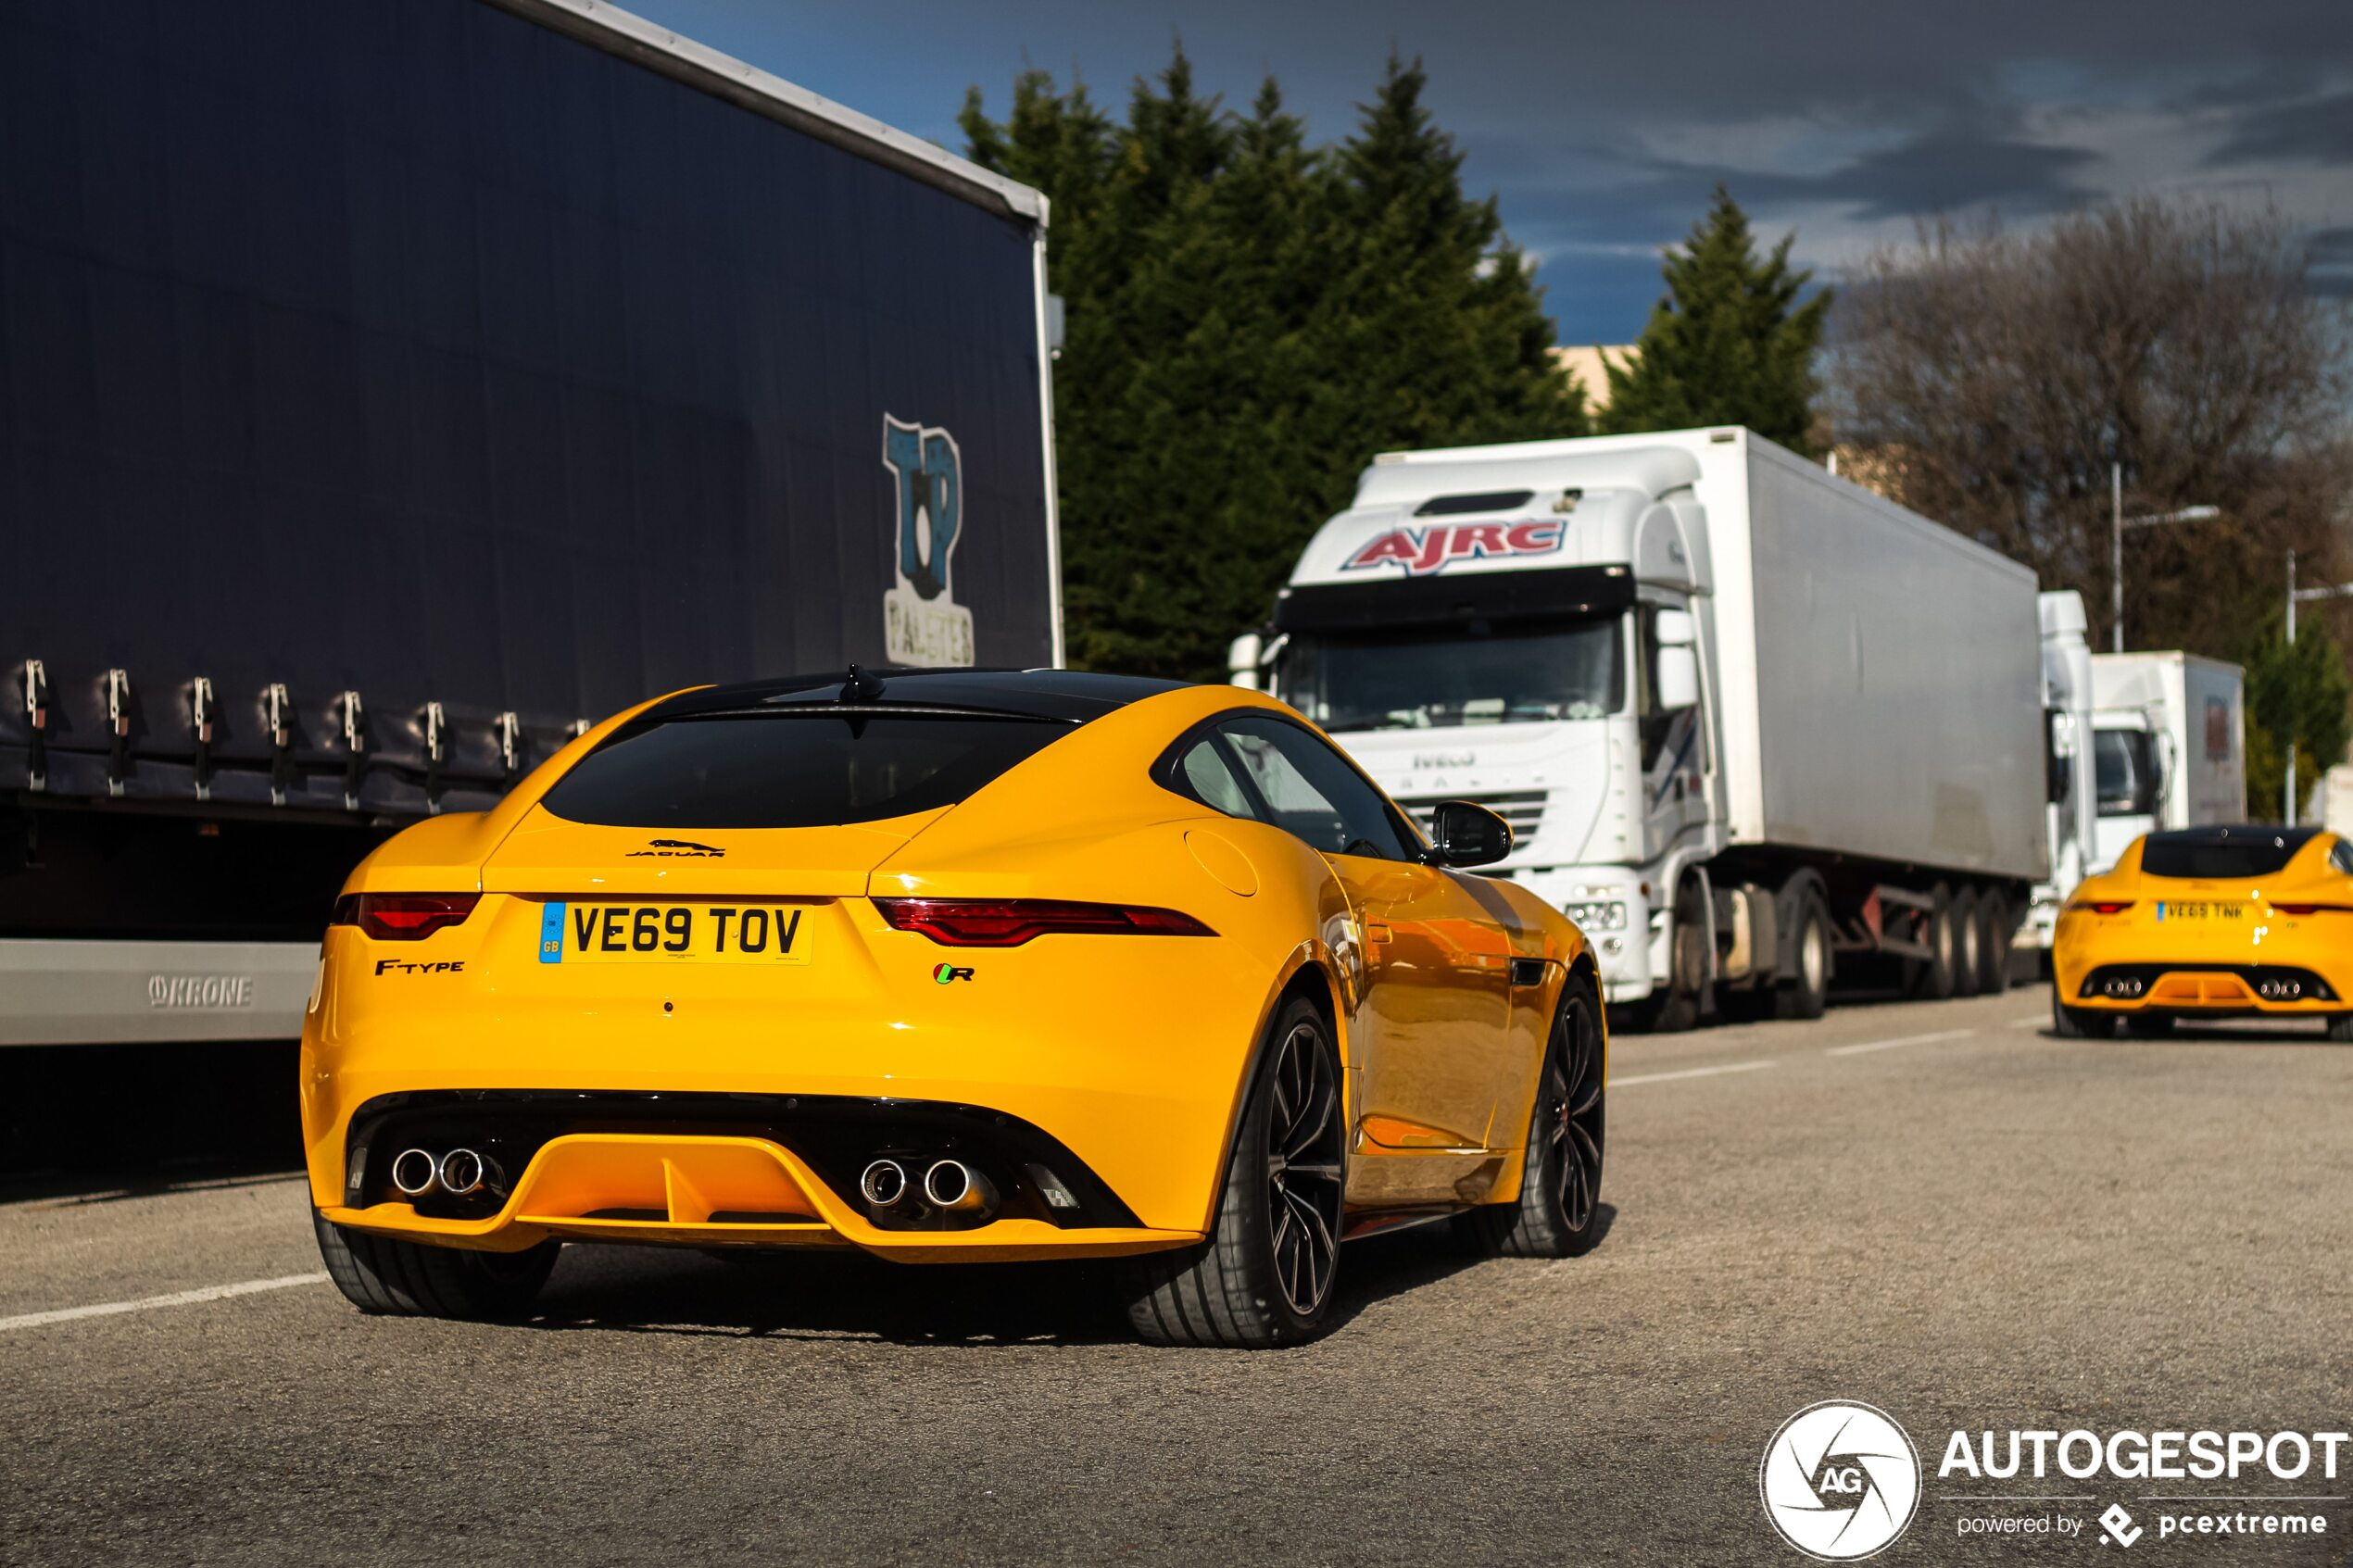 Primeur gespot: Nieuwe Jaguar F-Type R